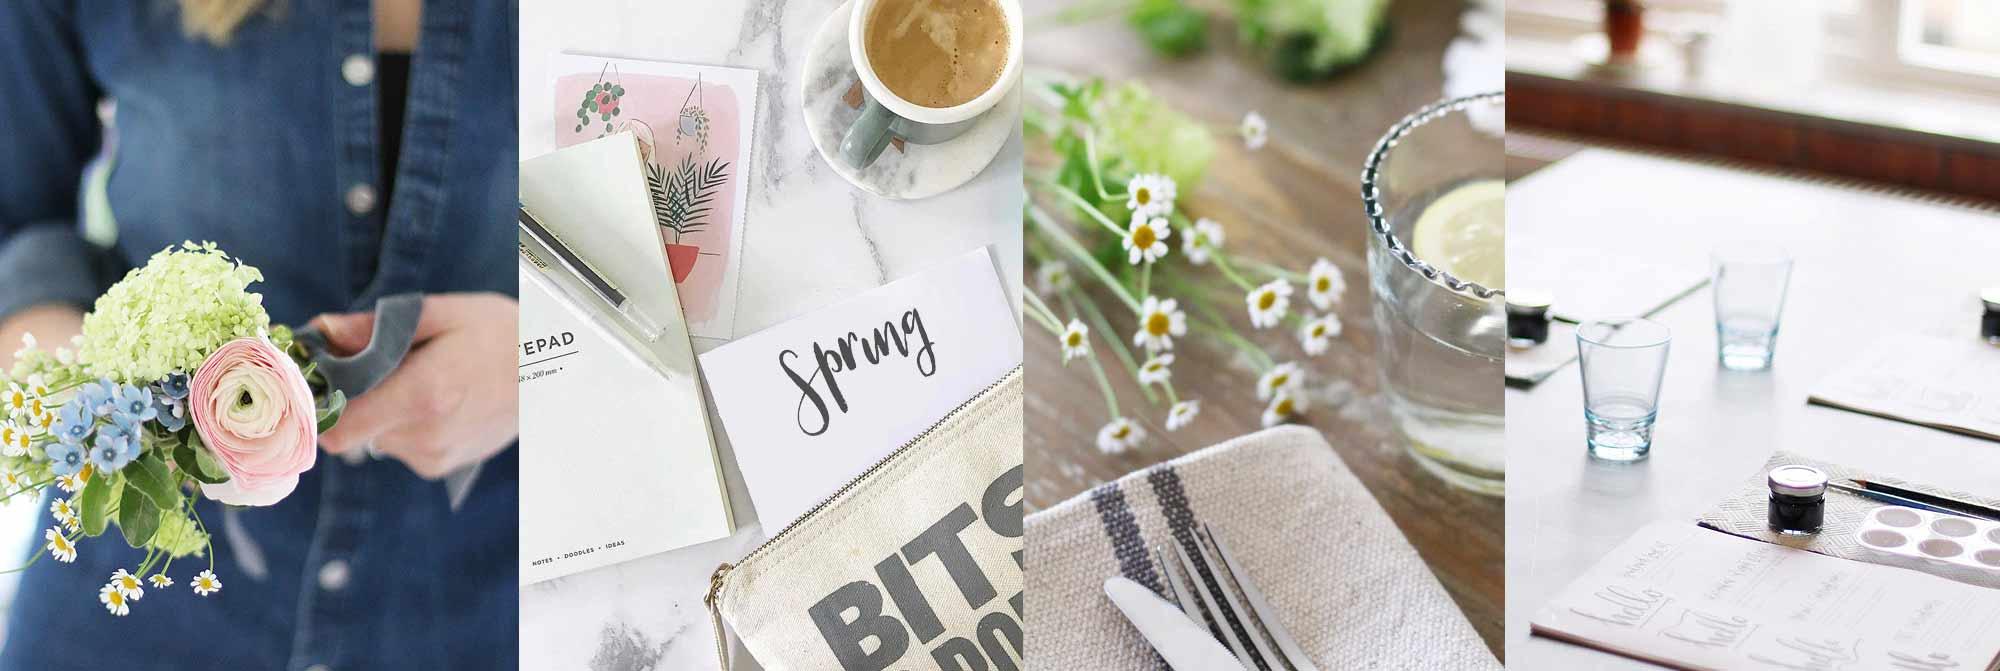 spring lifestyle workshop derbyshire